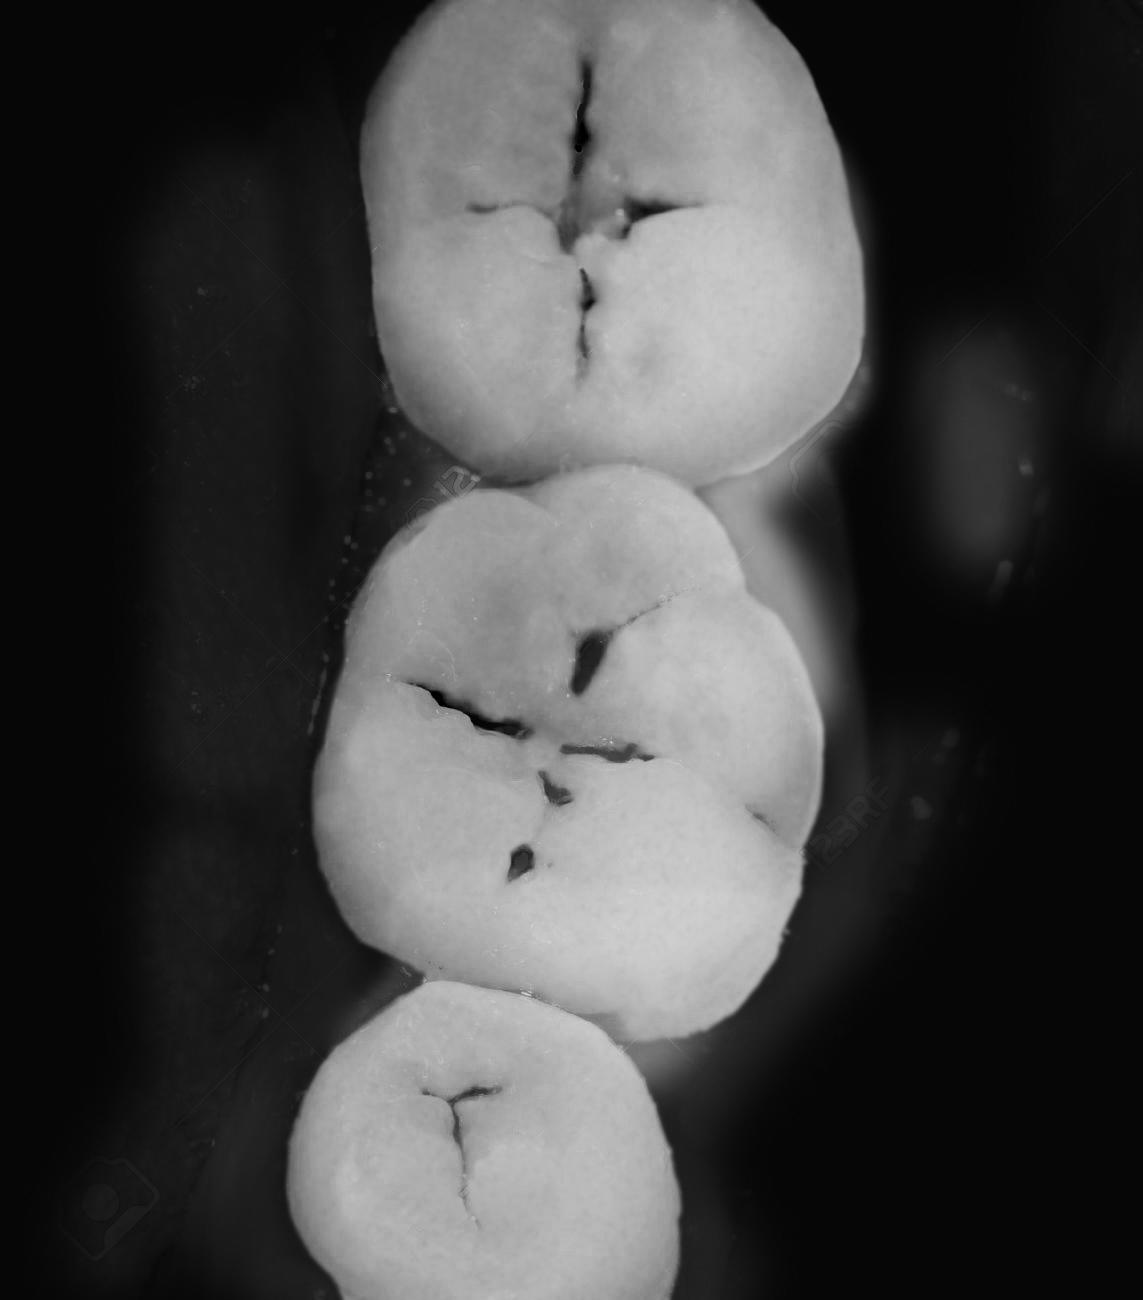 Transilluminating Light used to highlight cavities in the teeth.